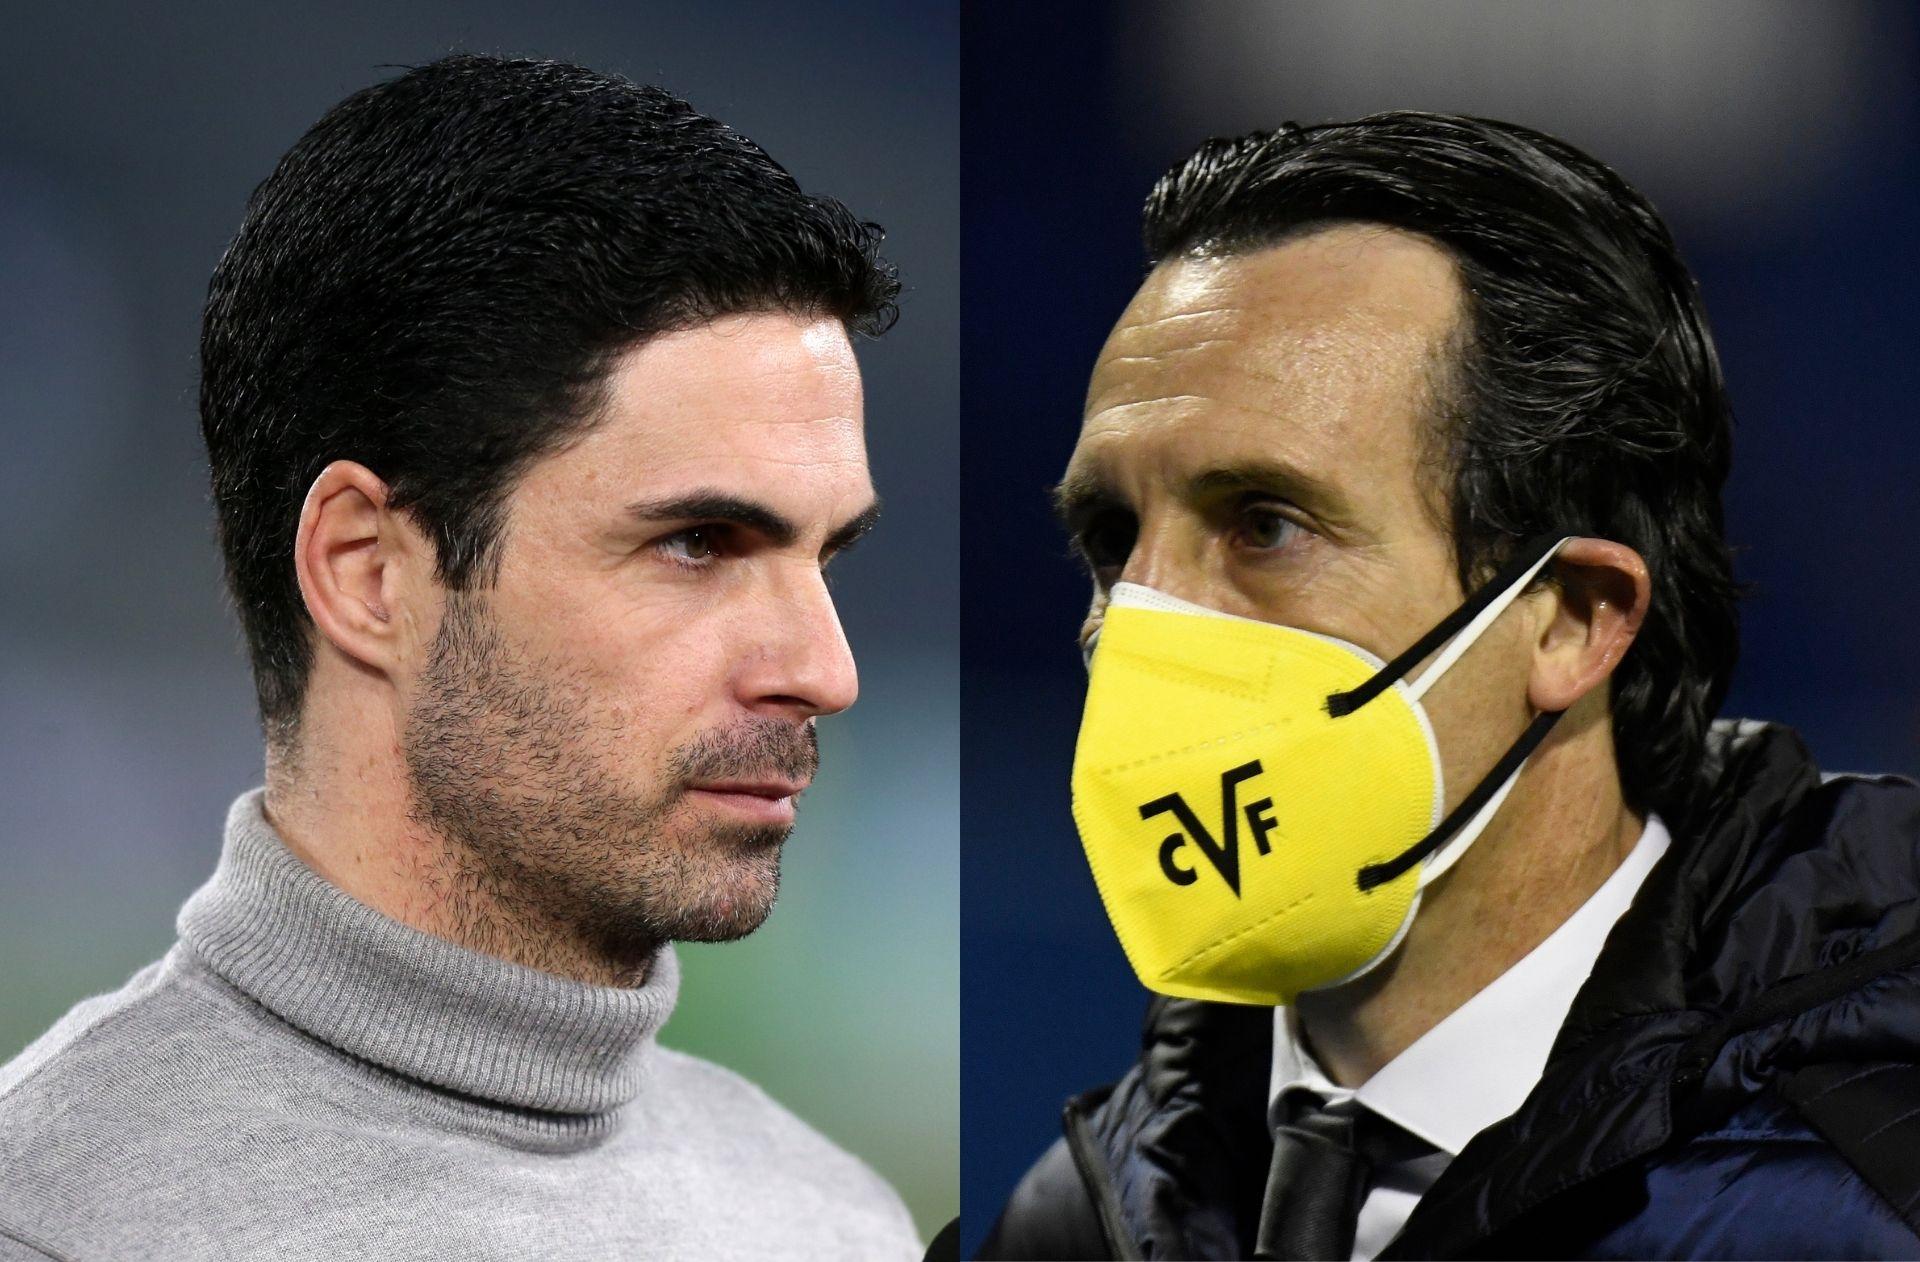 Mikel Arteta, Unai Emery, Arsenal